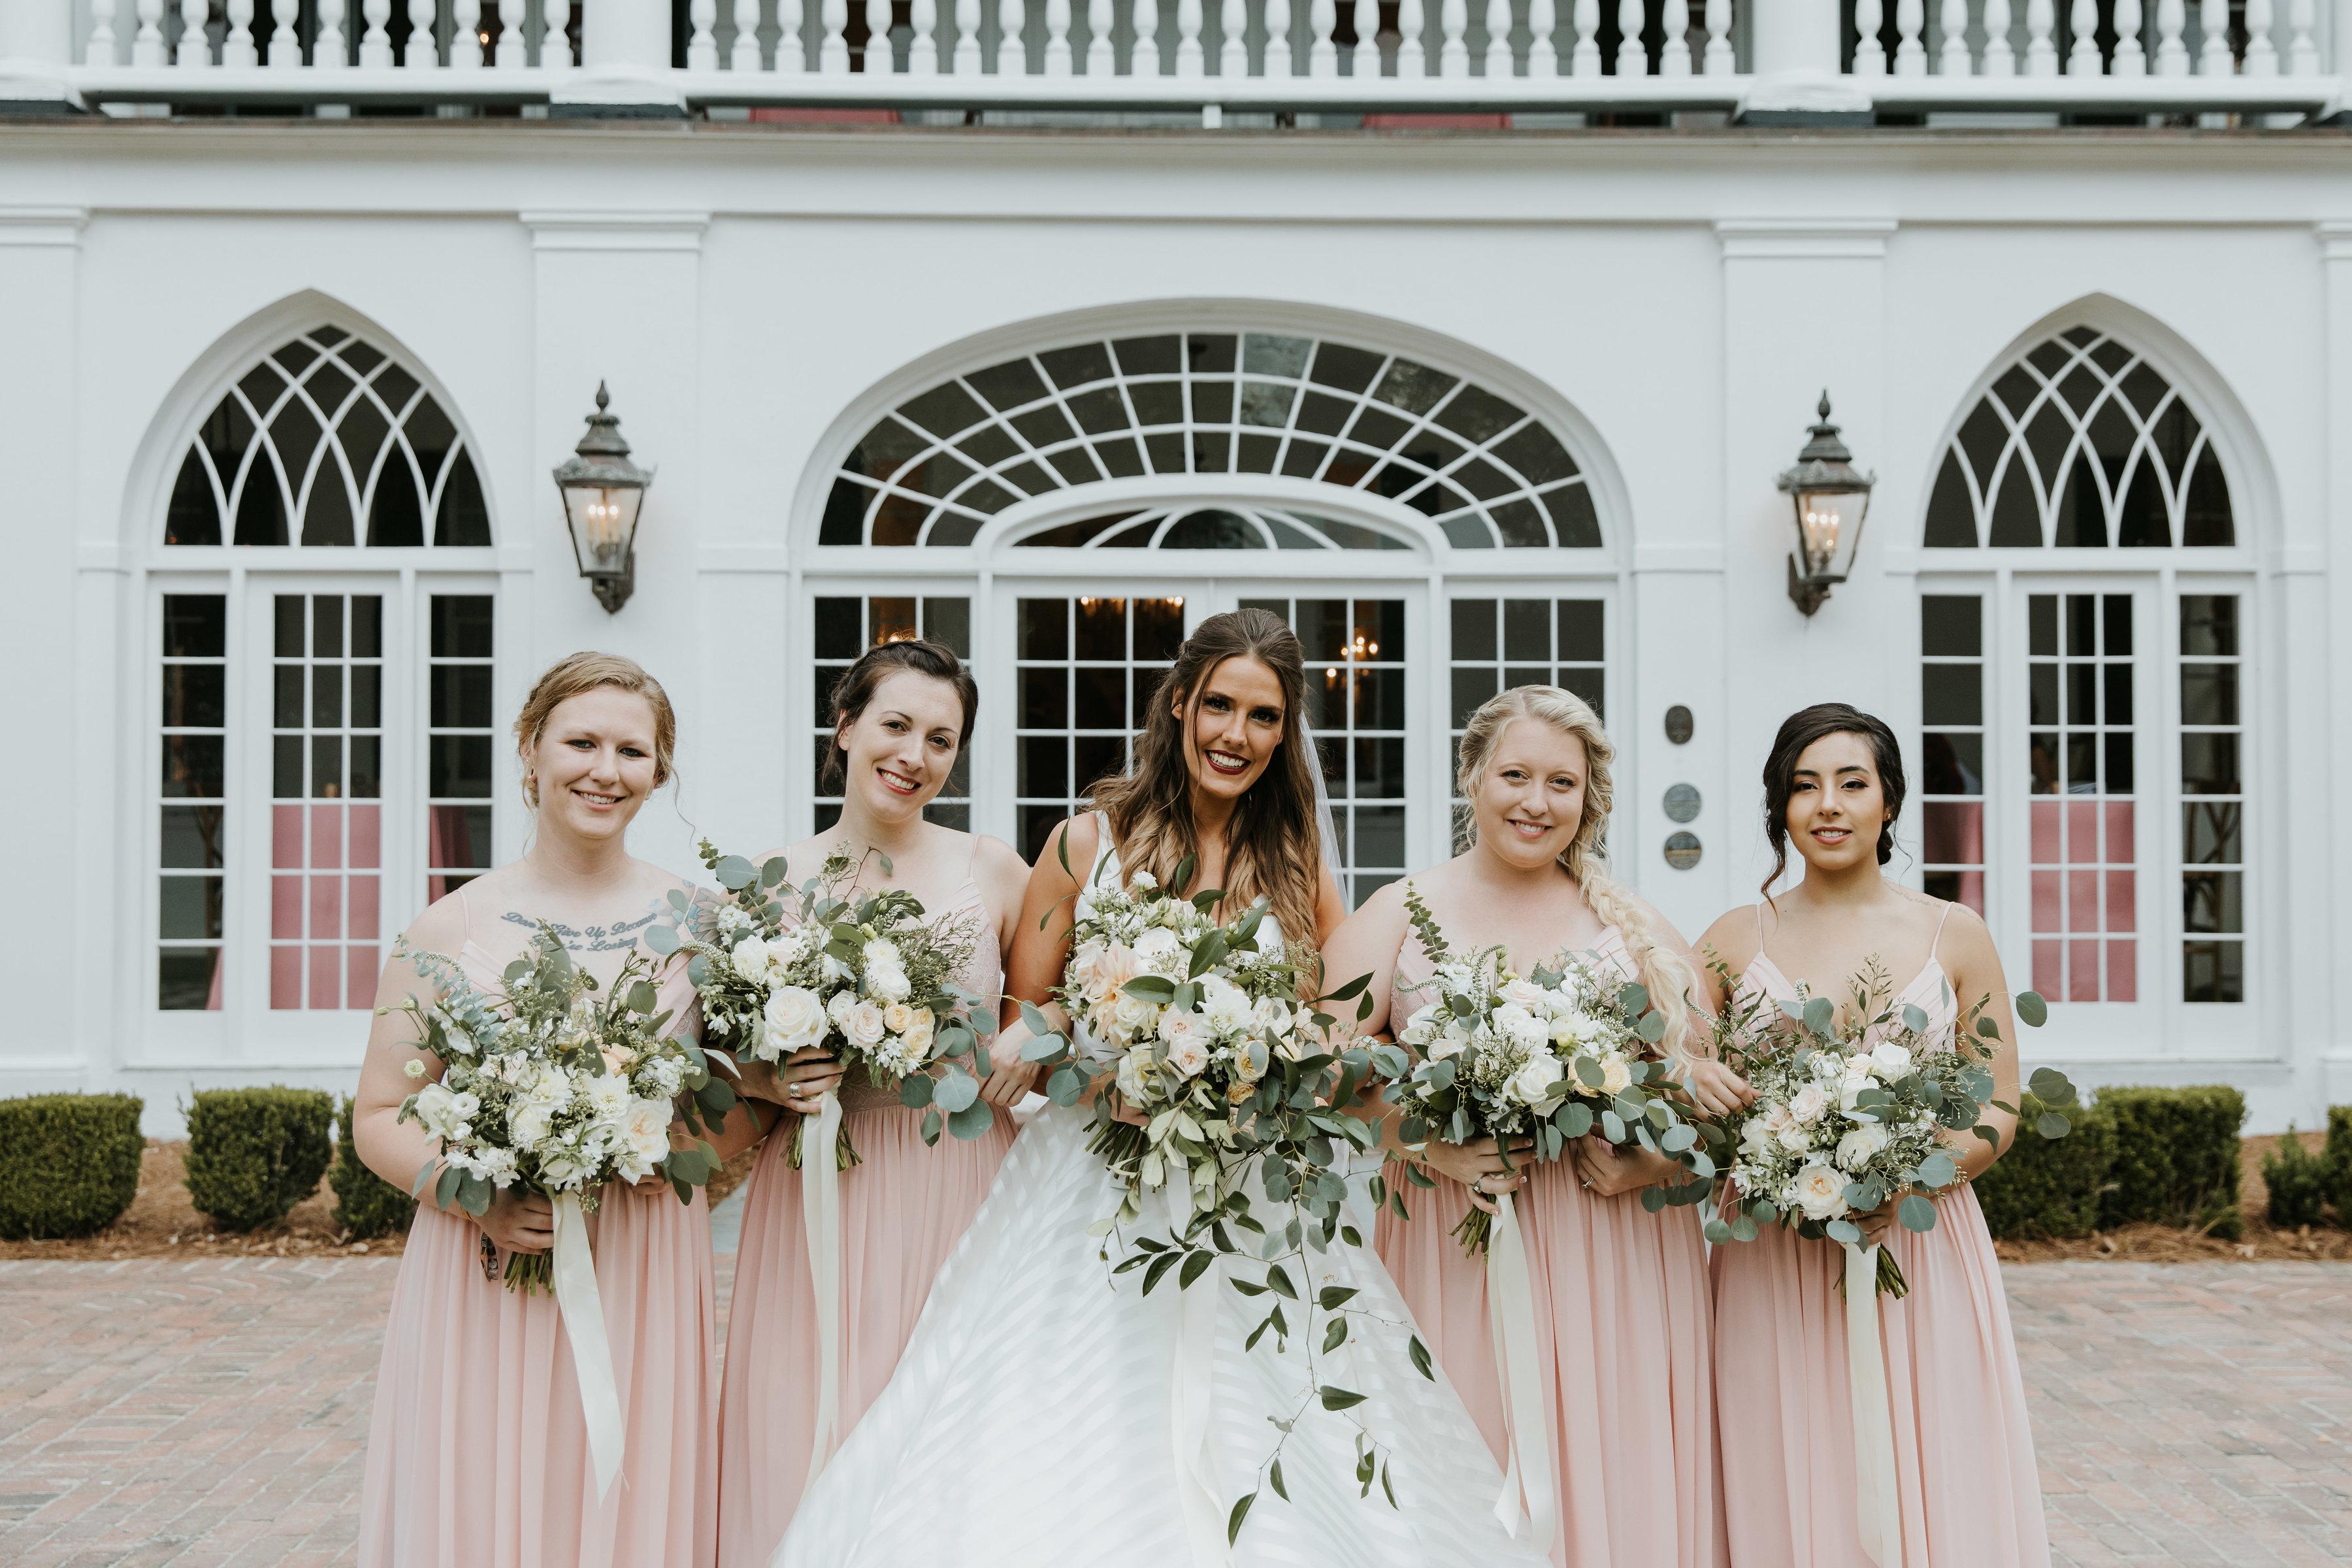 Lowndes-Grove-Charleston-SC-wedding-portrait-photography-292